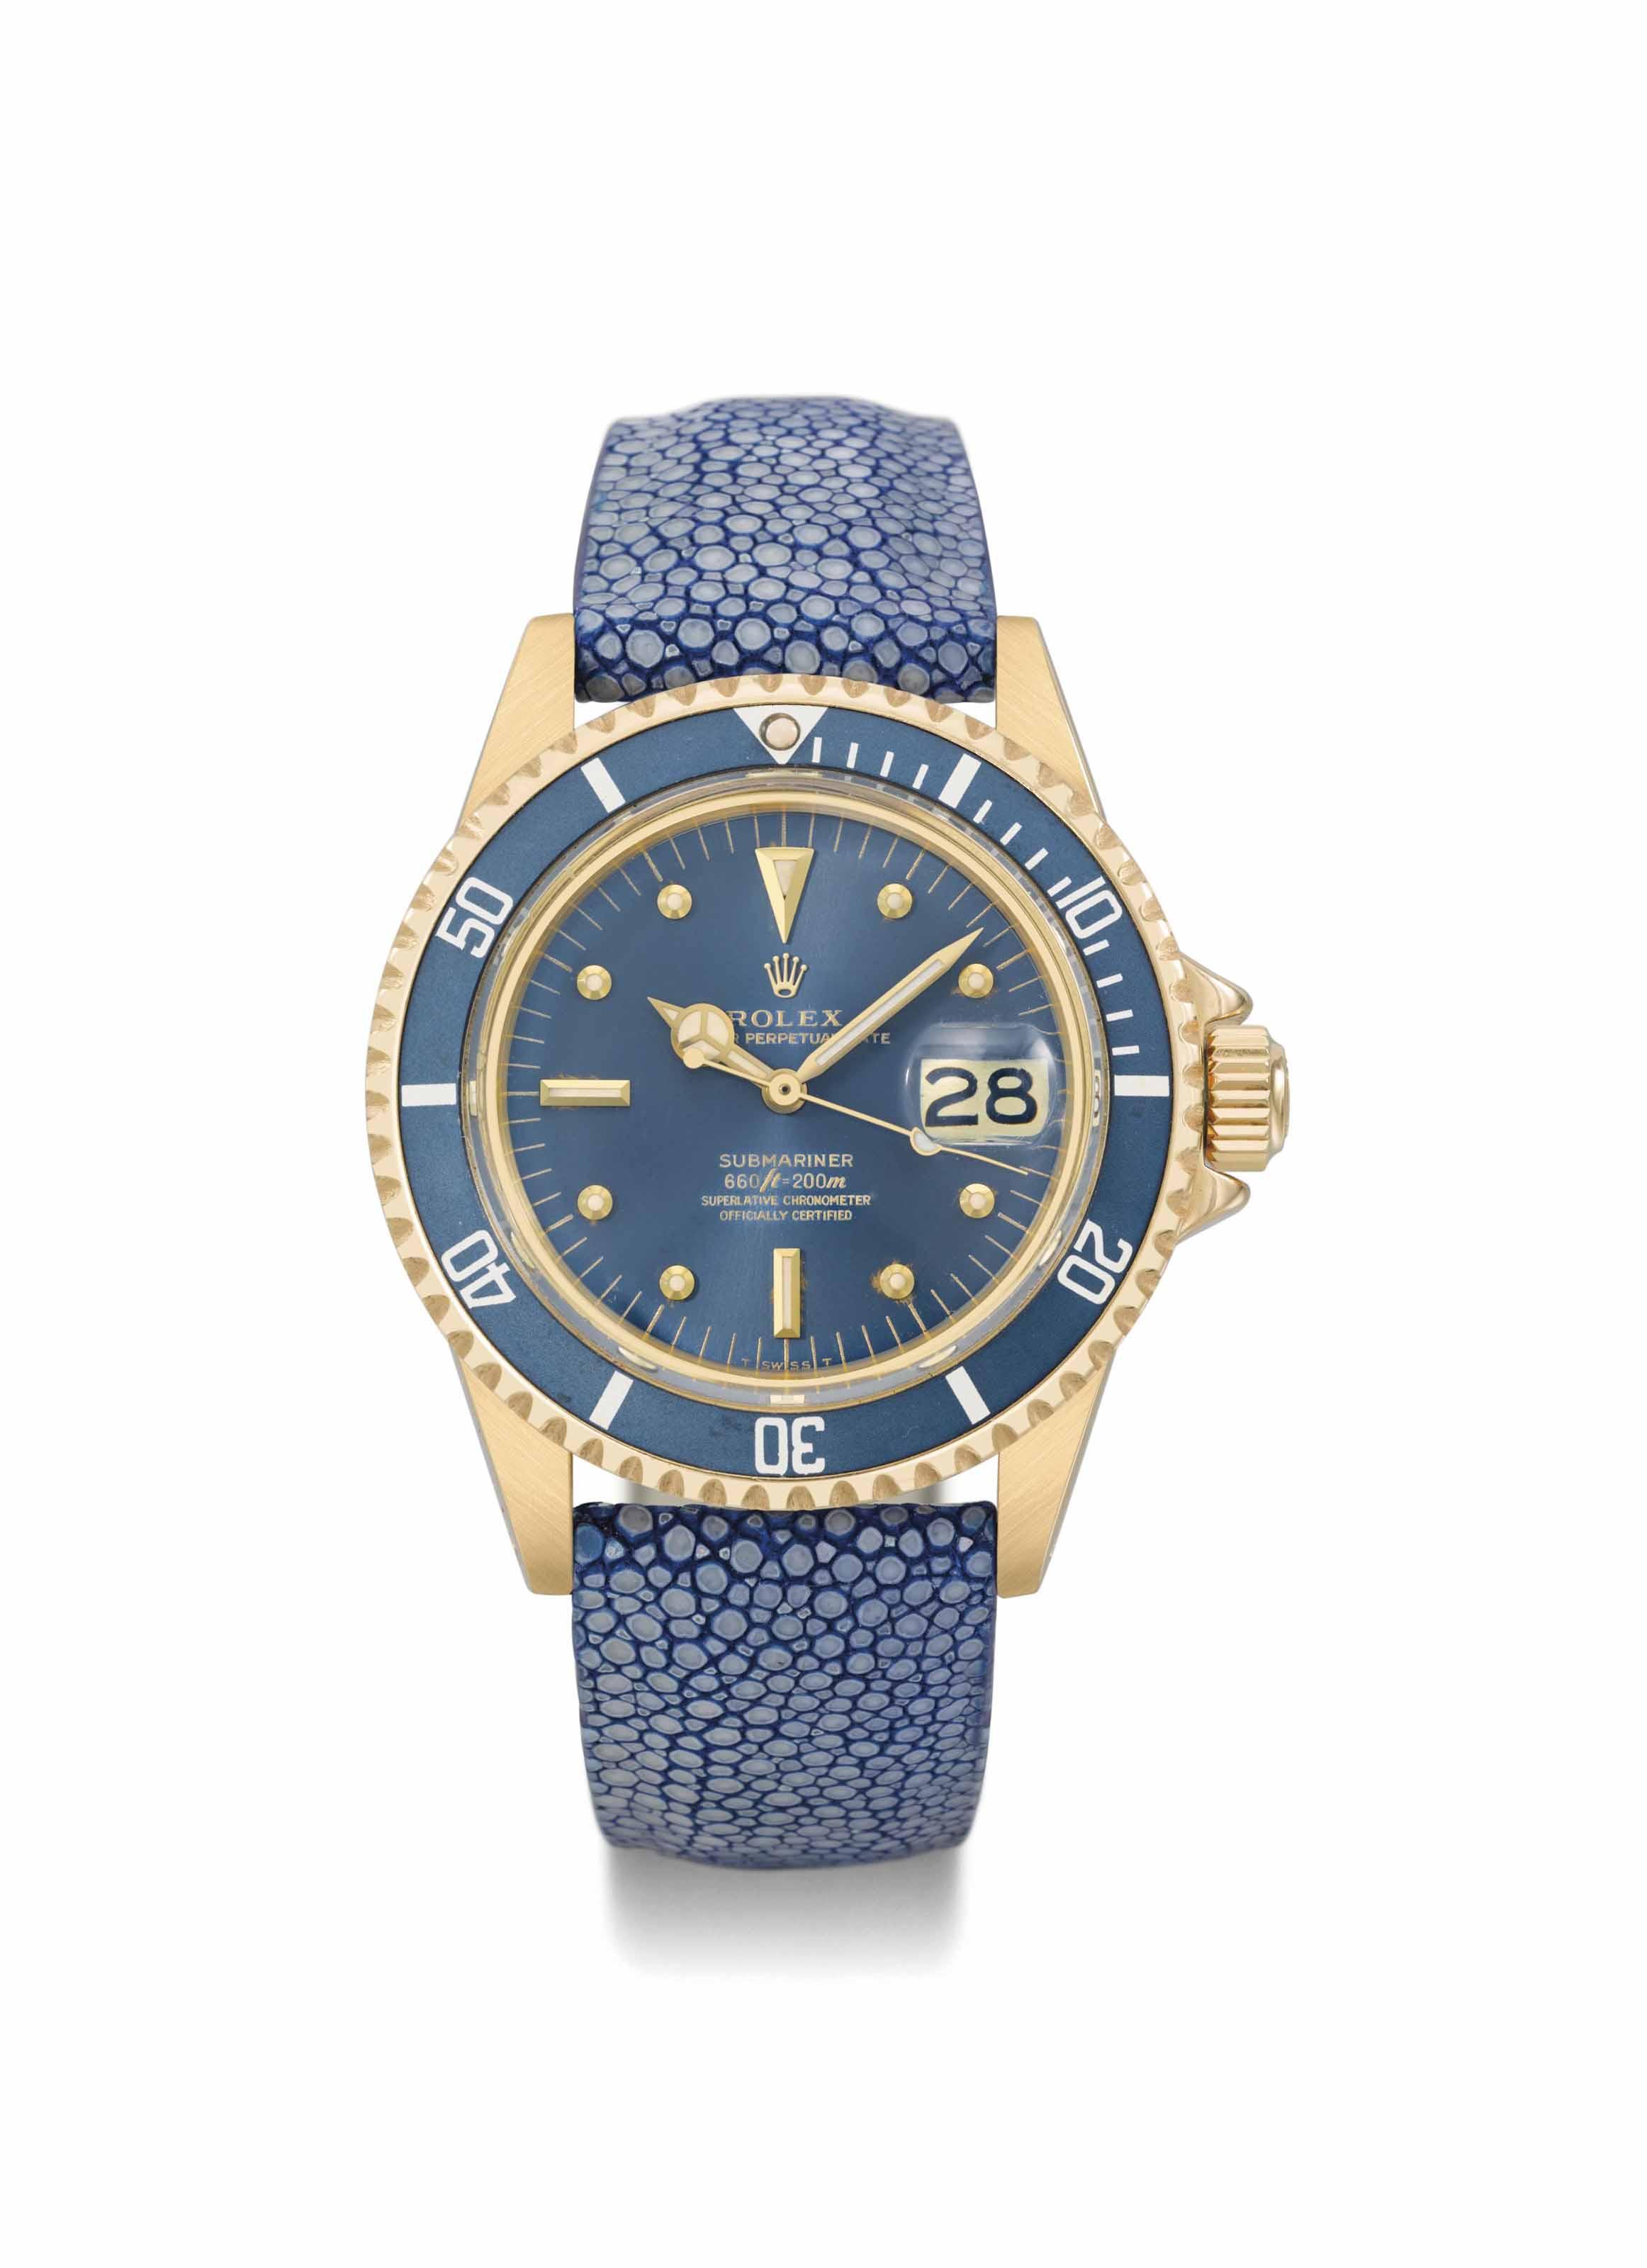 Rolex. An attractive 18K gold